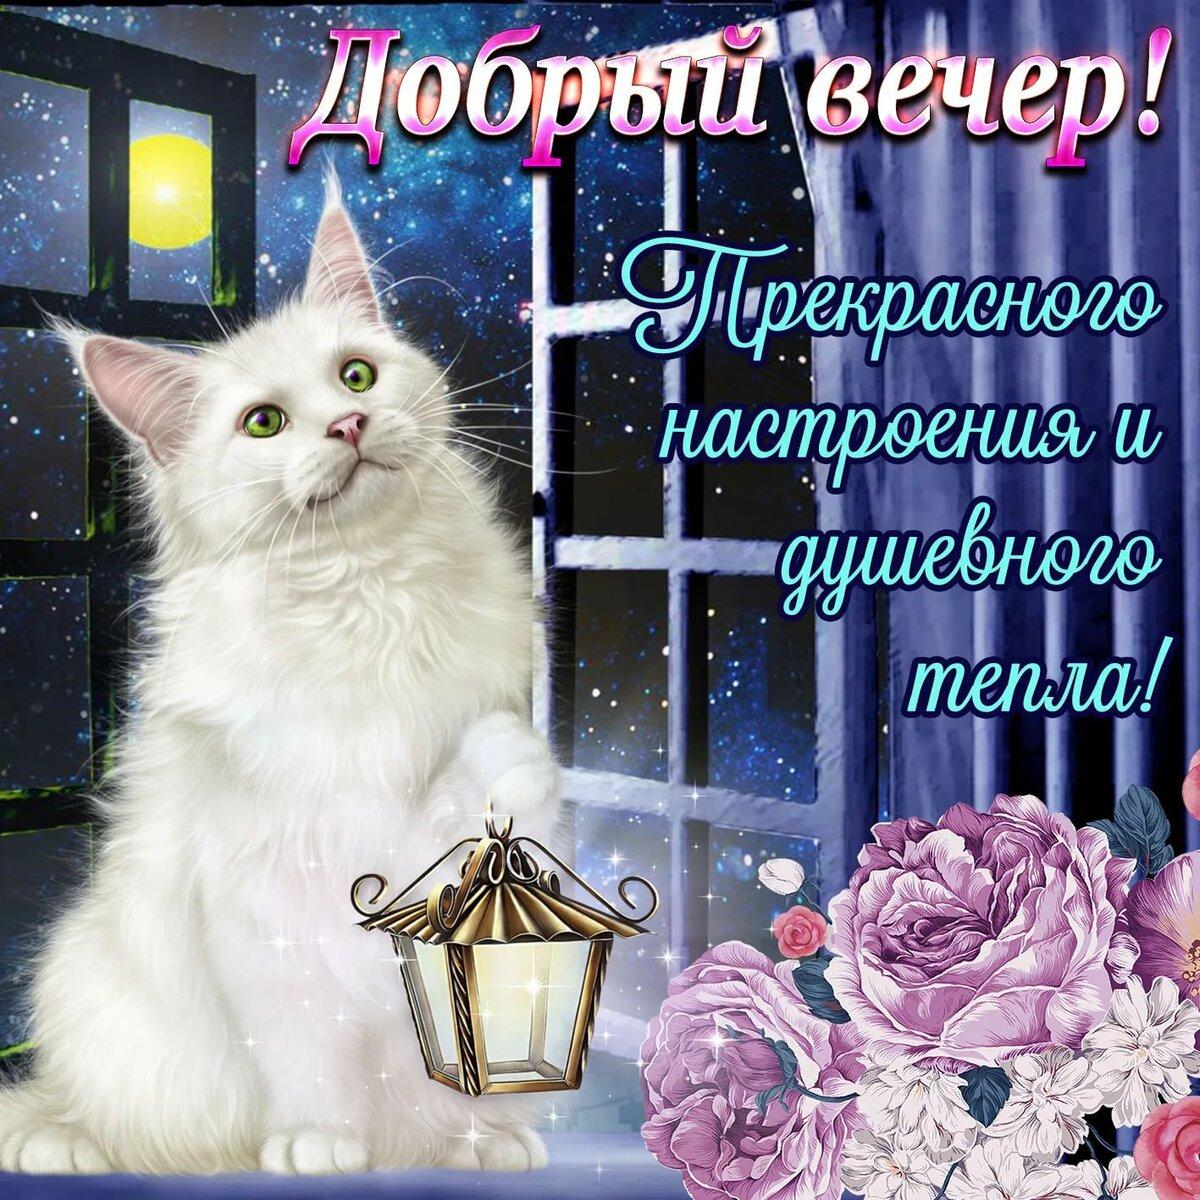 Добрый вечер вам открытка